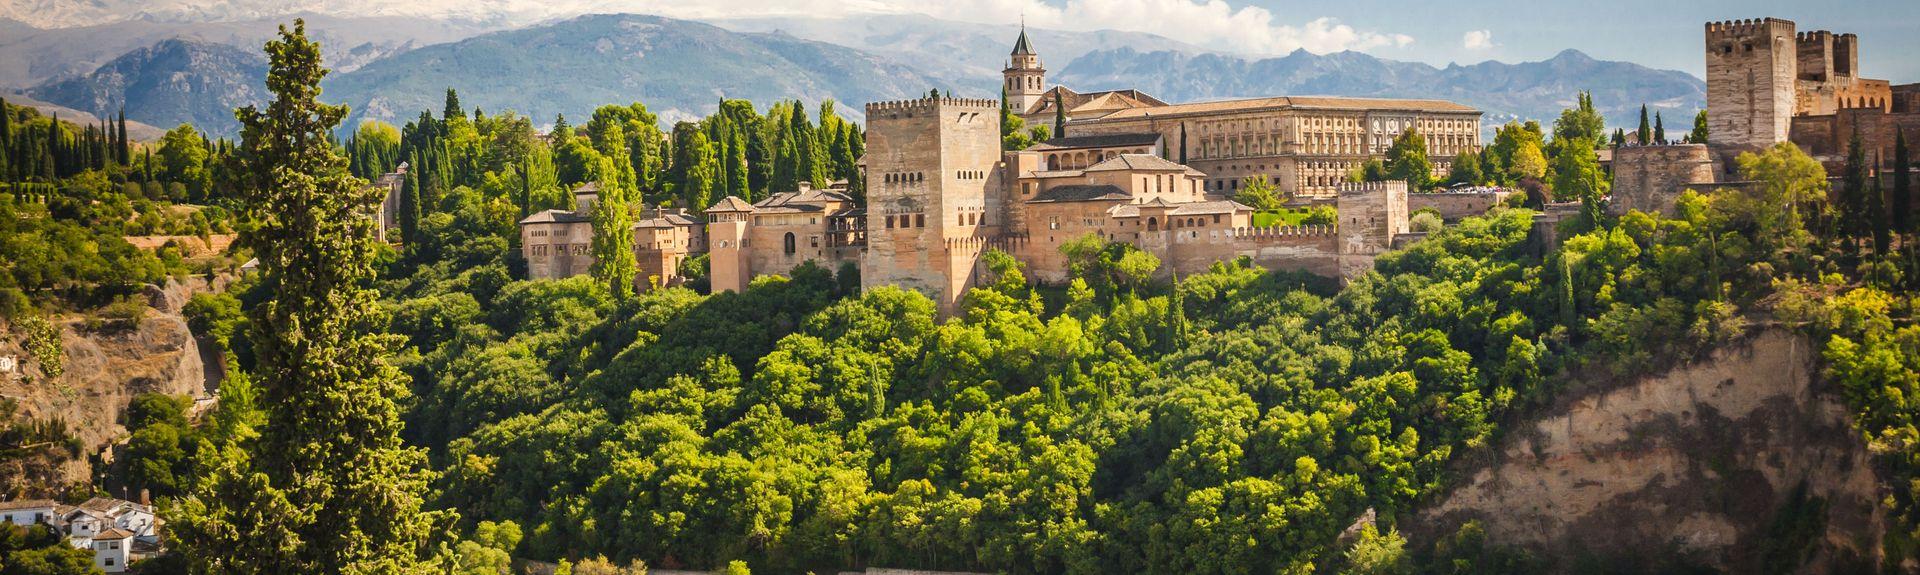 Granada, Vega de Granada, Andalusien, Spanien